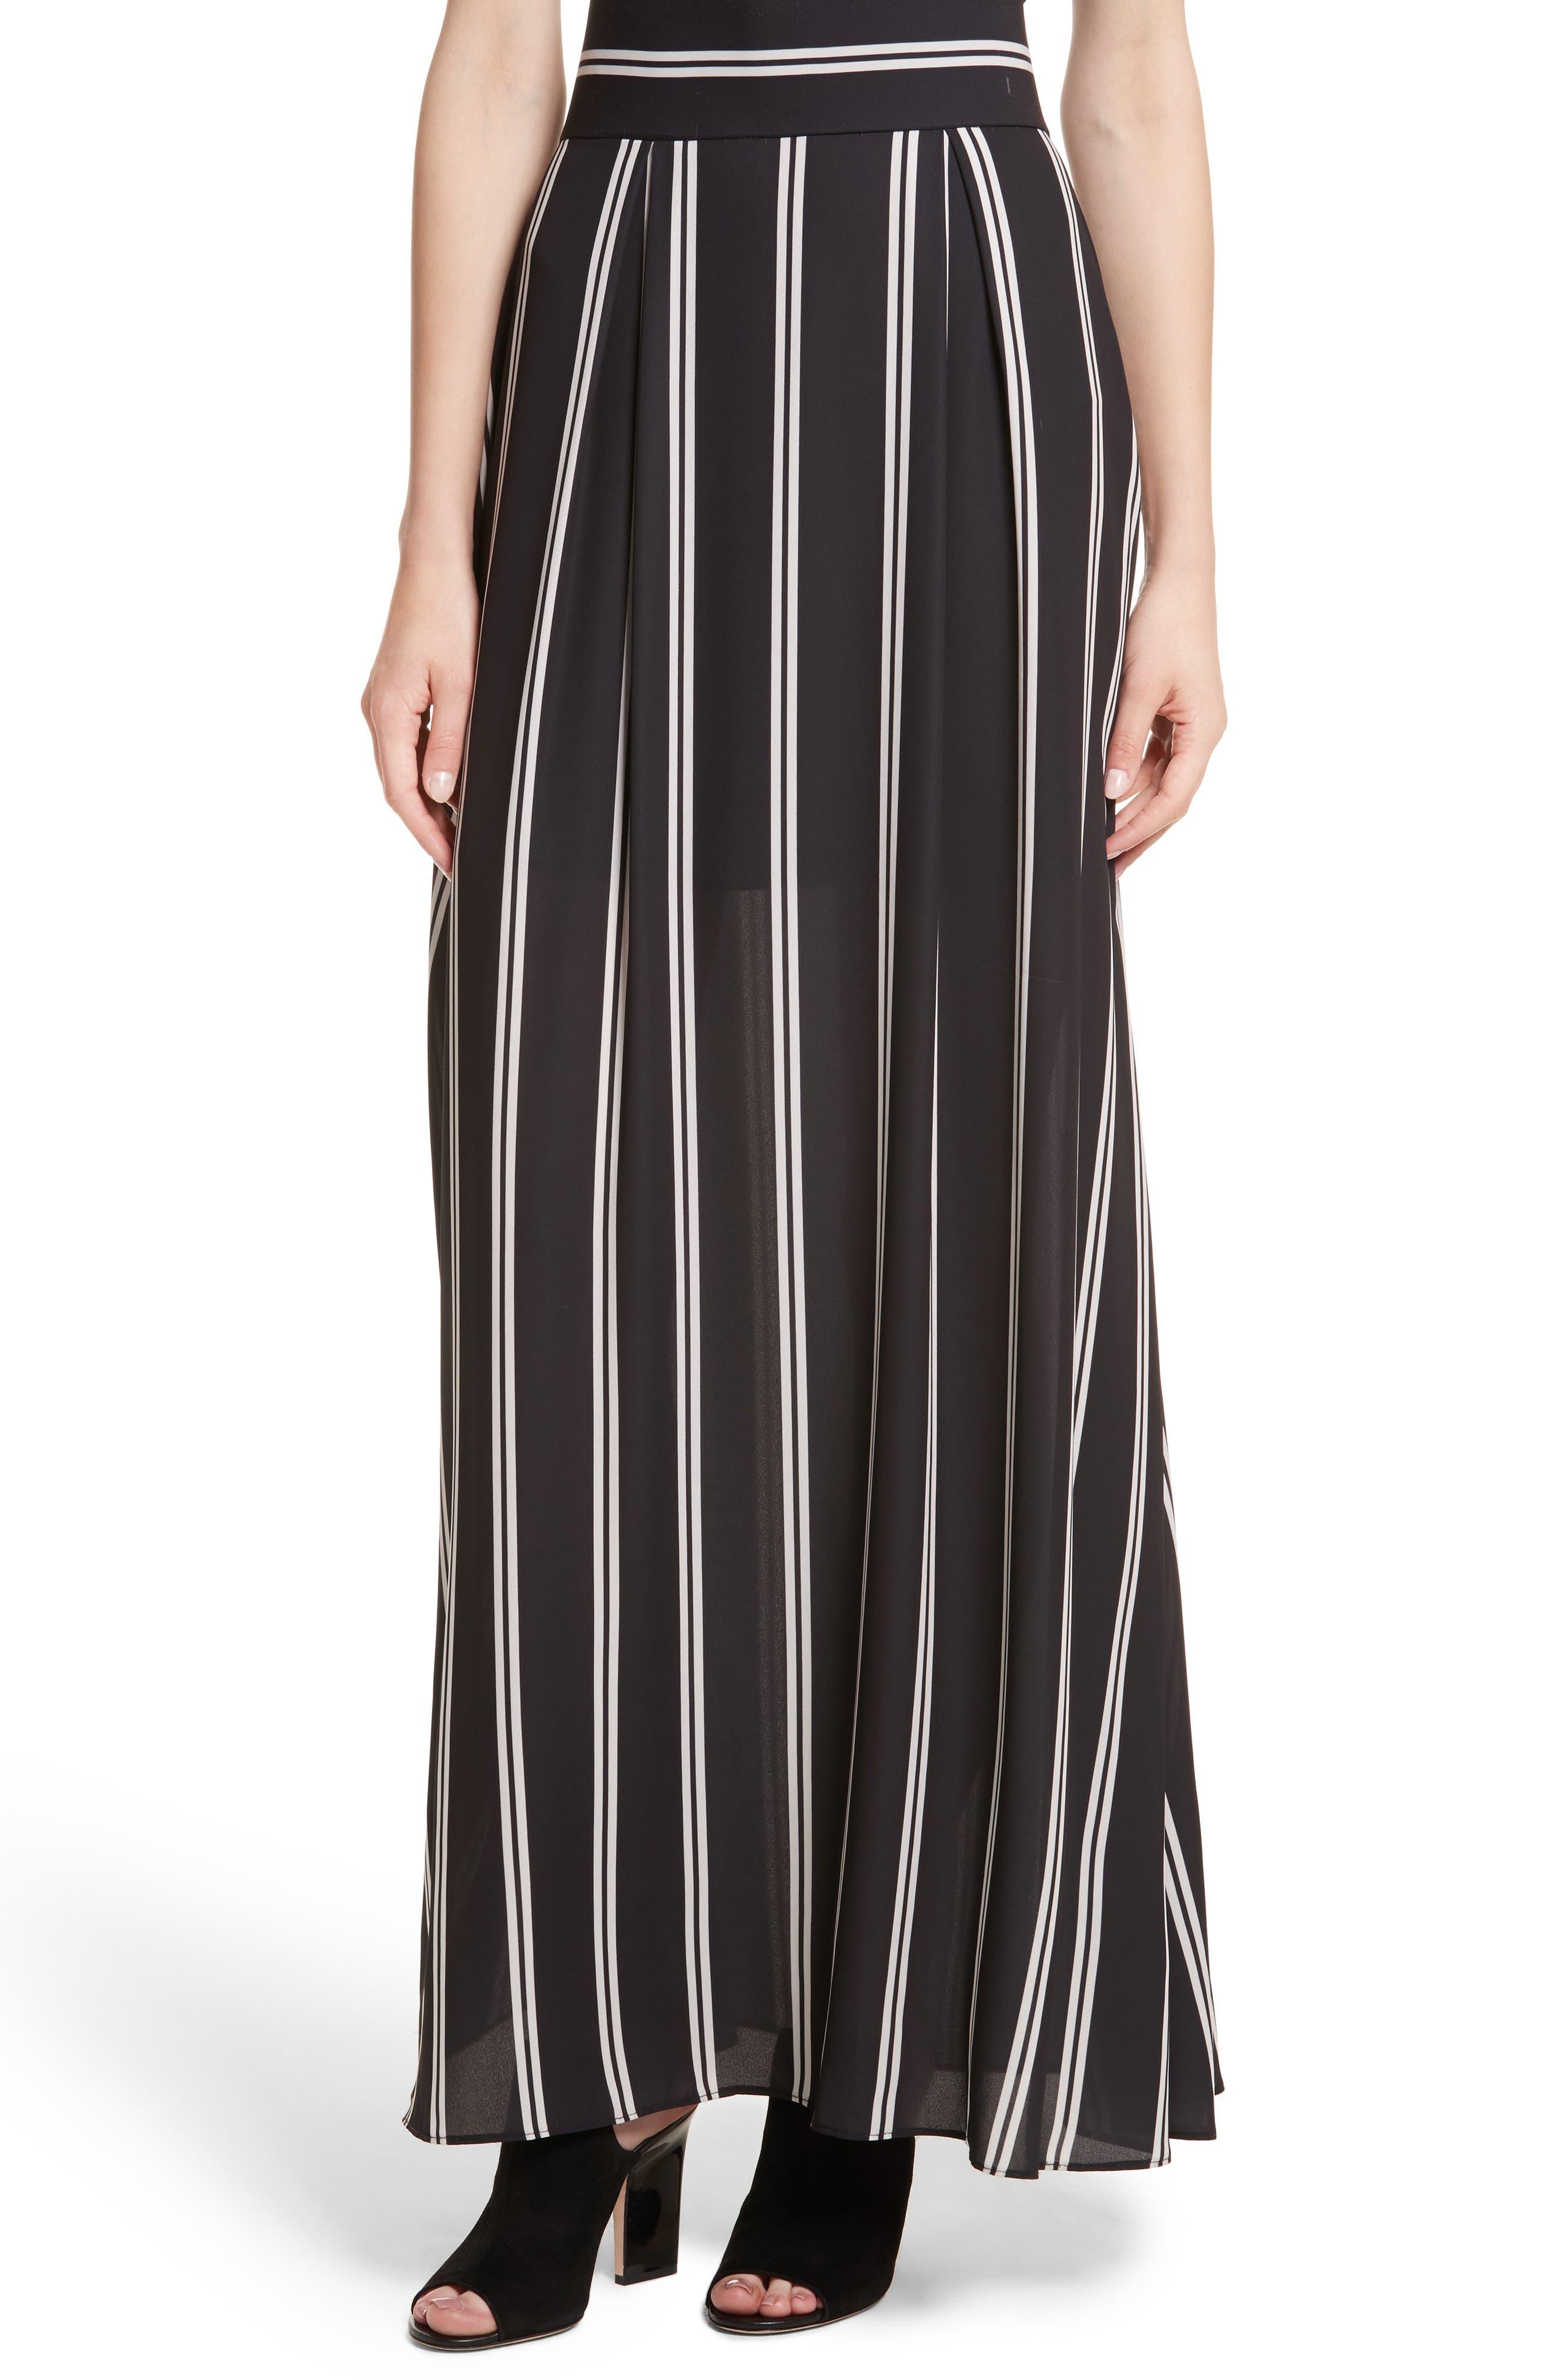 Alternate Image 1 Selected - Alice + Olivia Gabel Clean Pleat Maxi Skirt